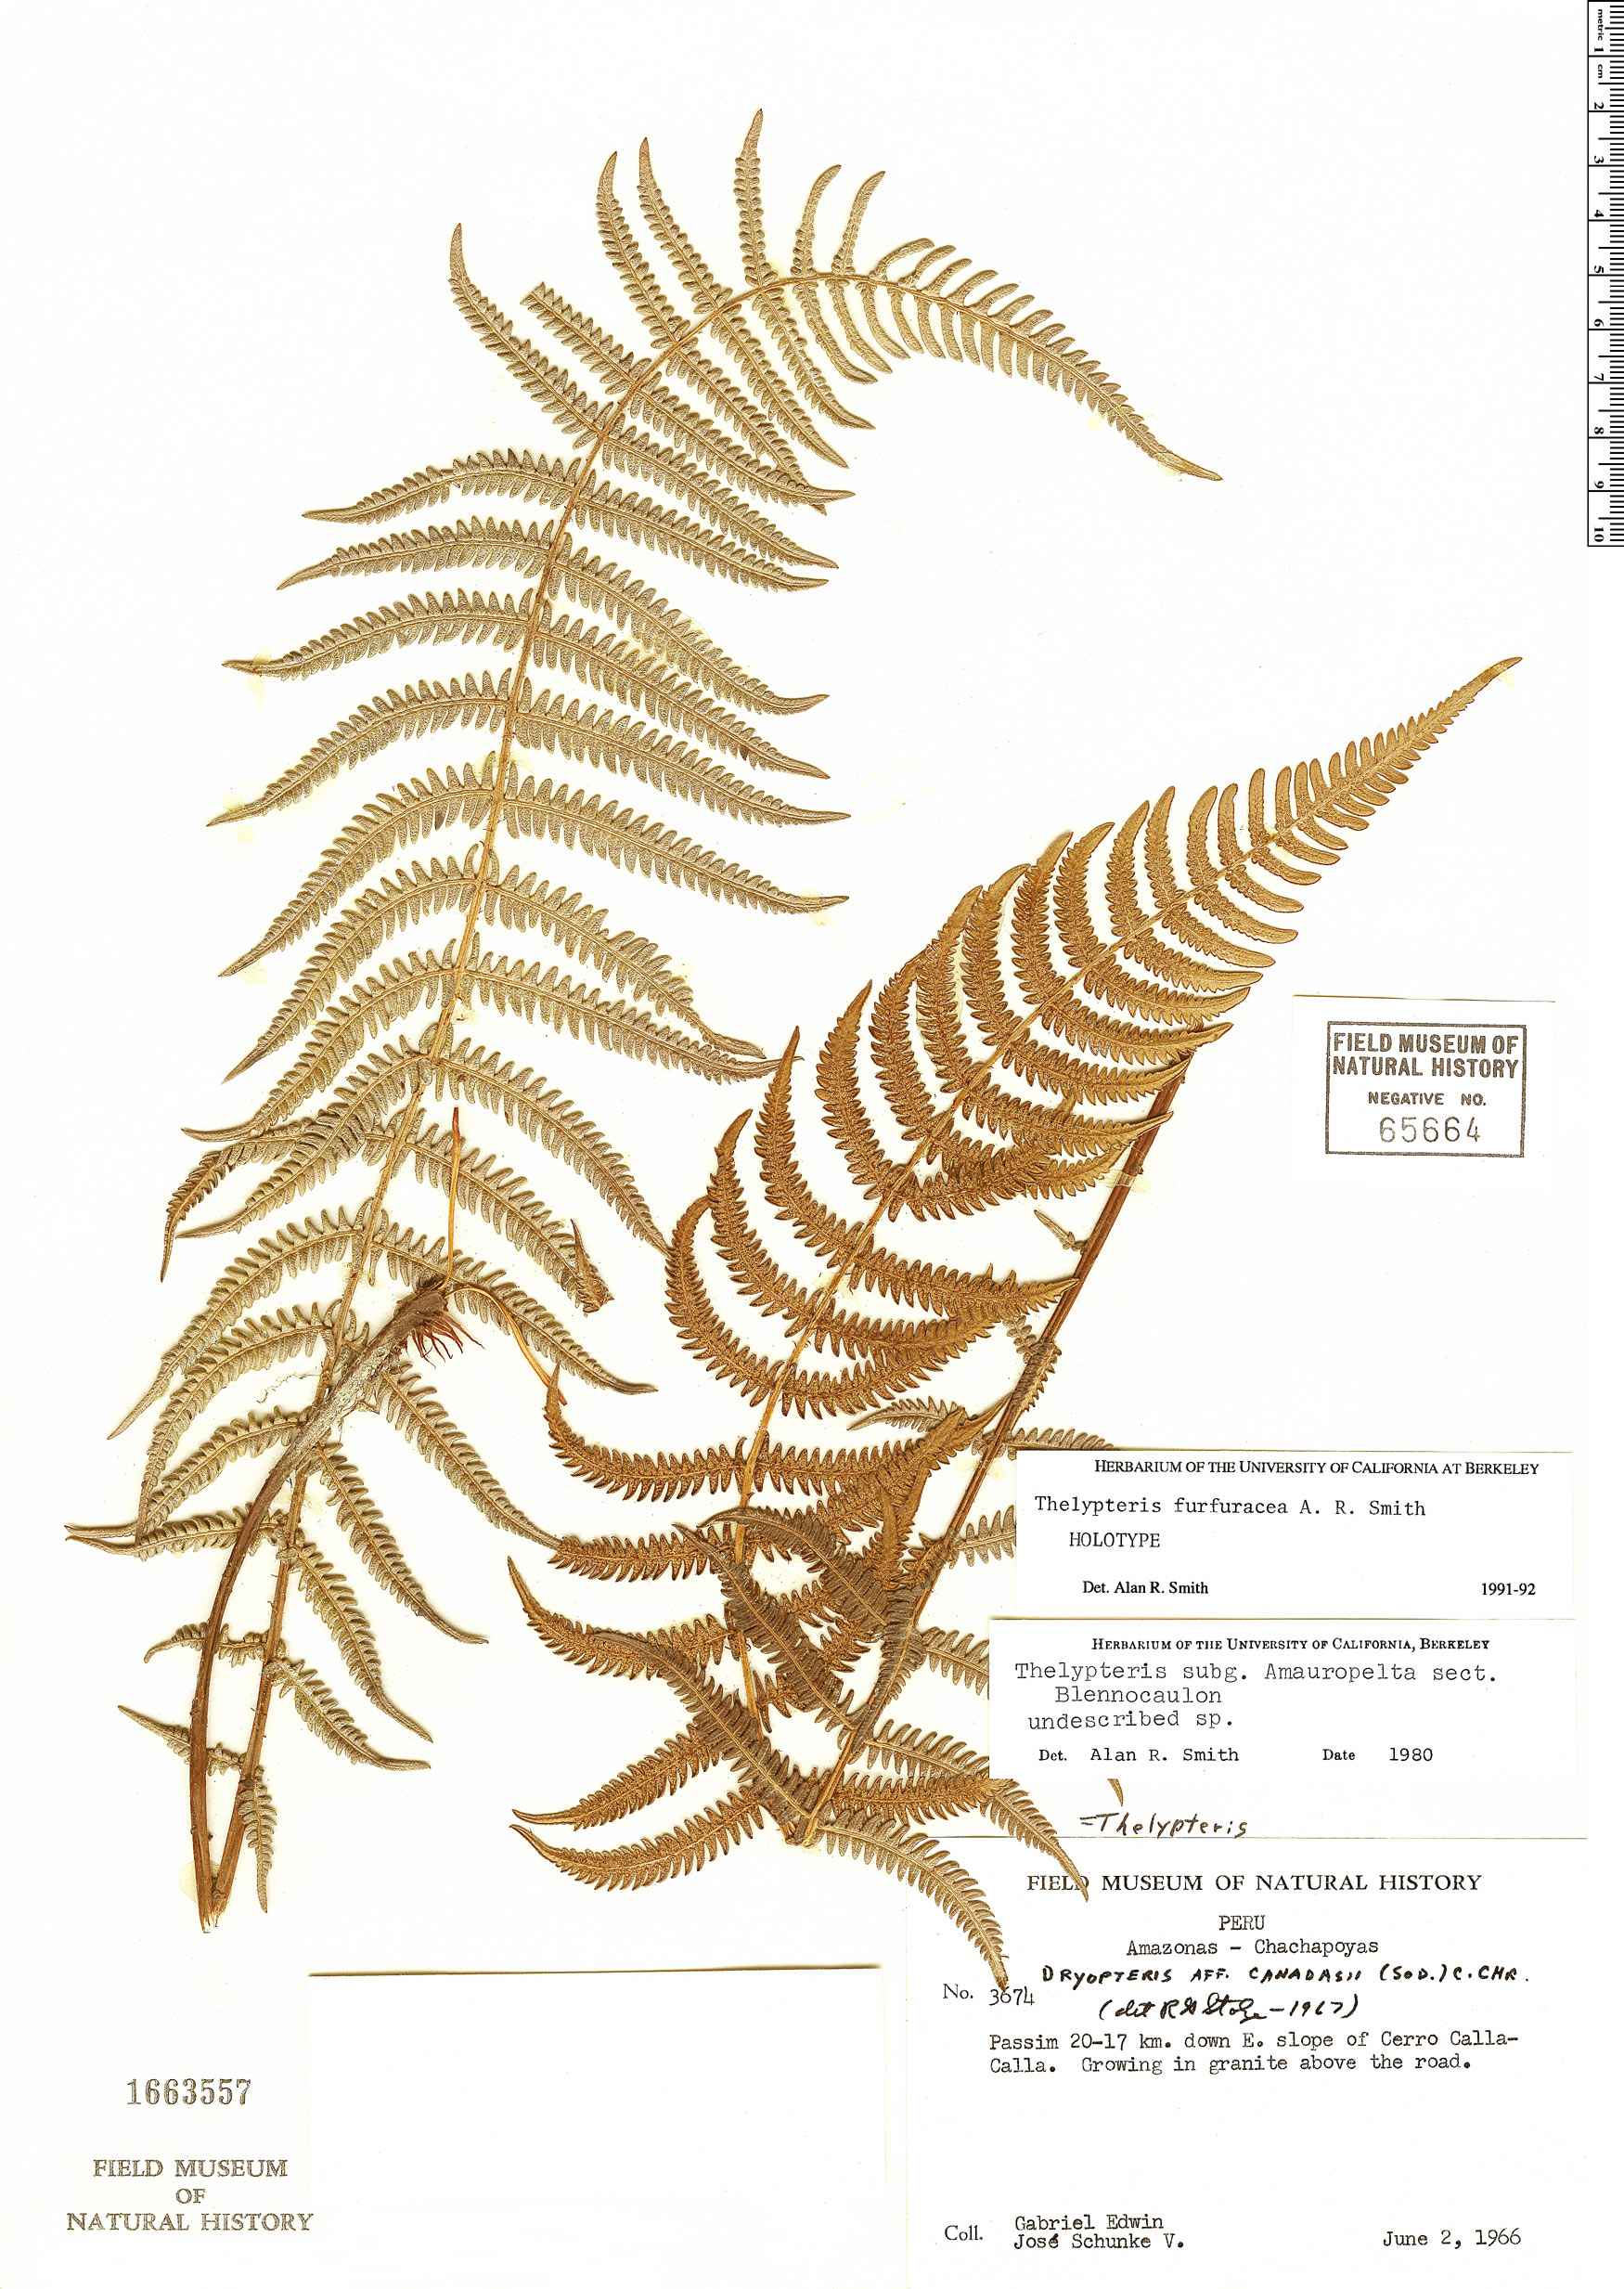 Specimen: Thelypteris furfuracea